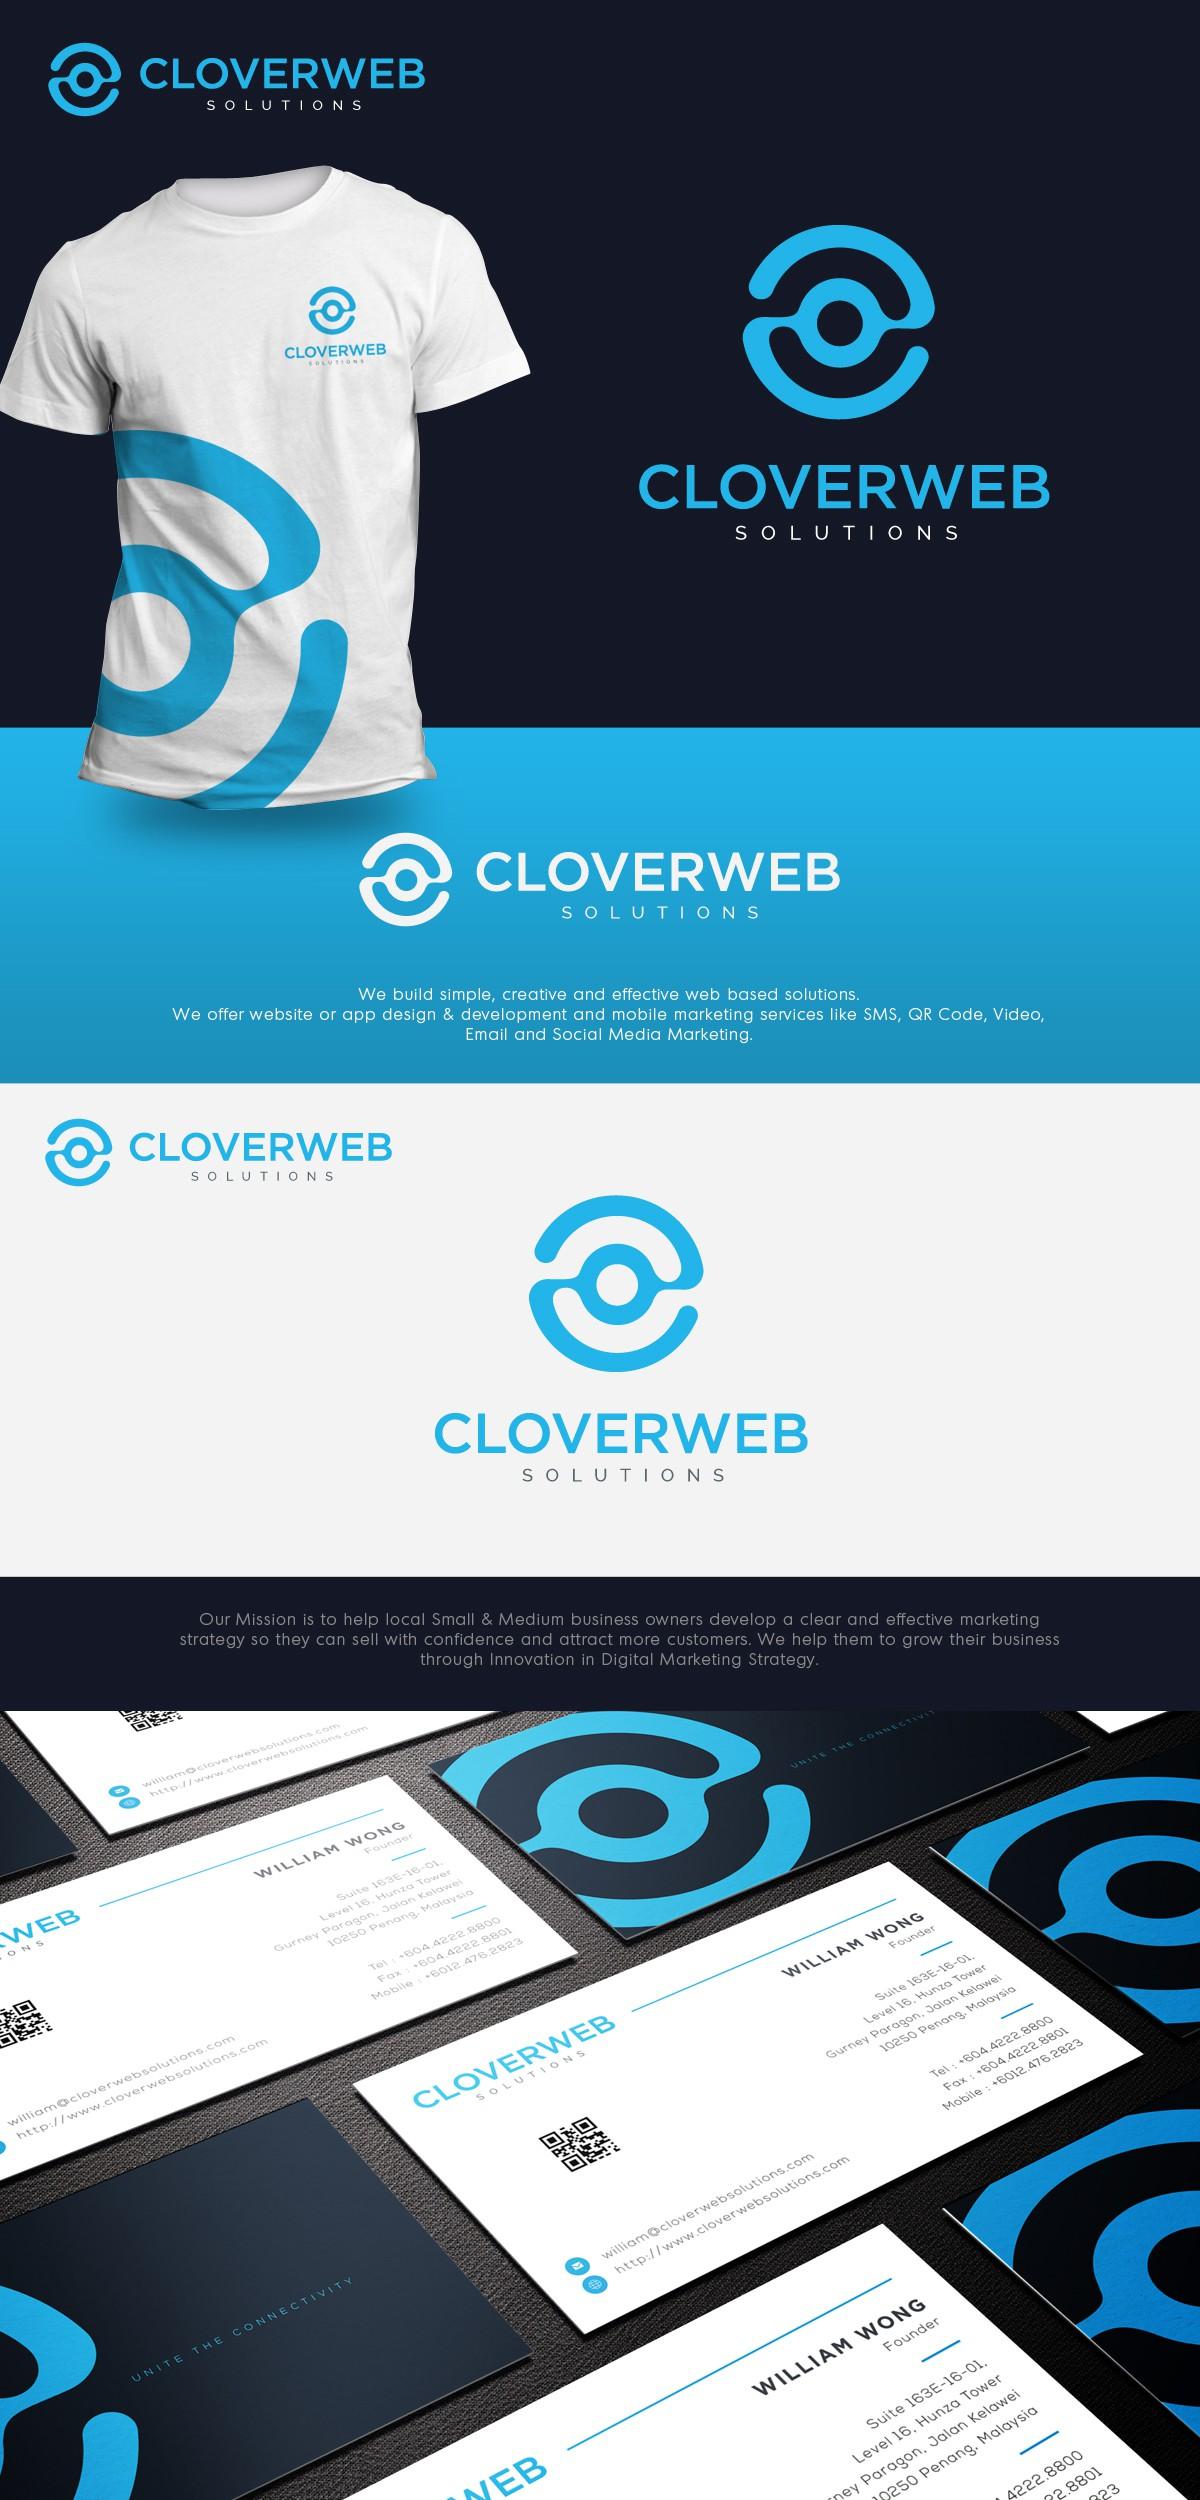 Create a Simple, Unique, Modern & Elegant Logo + Business Card (w/QR) for a Web Agency